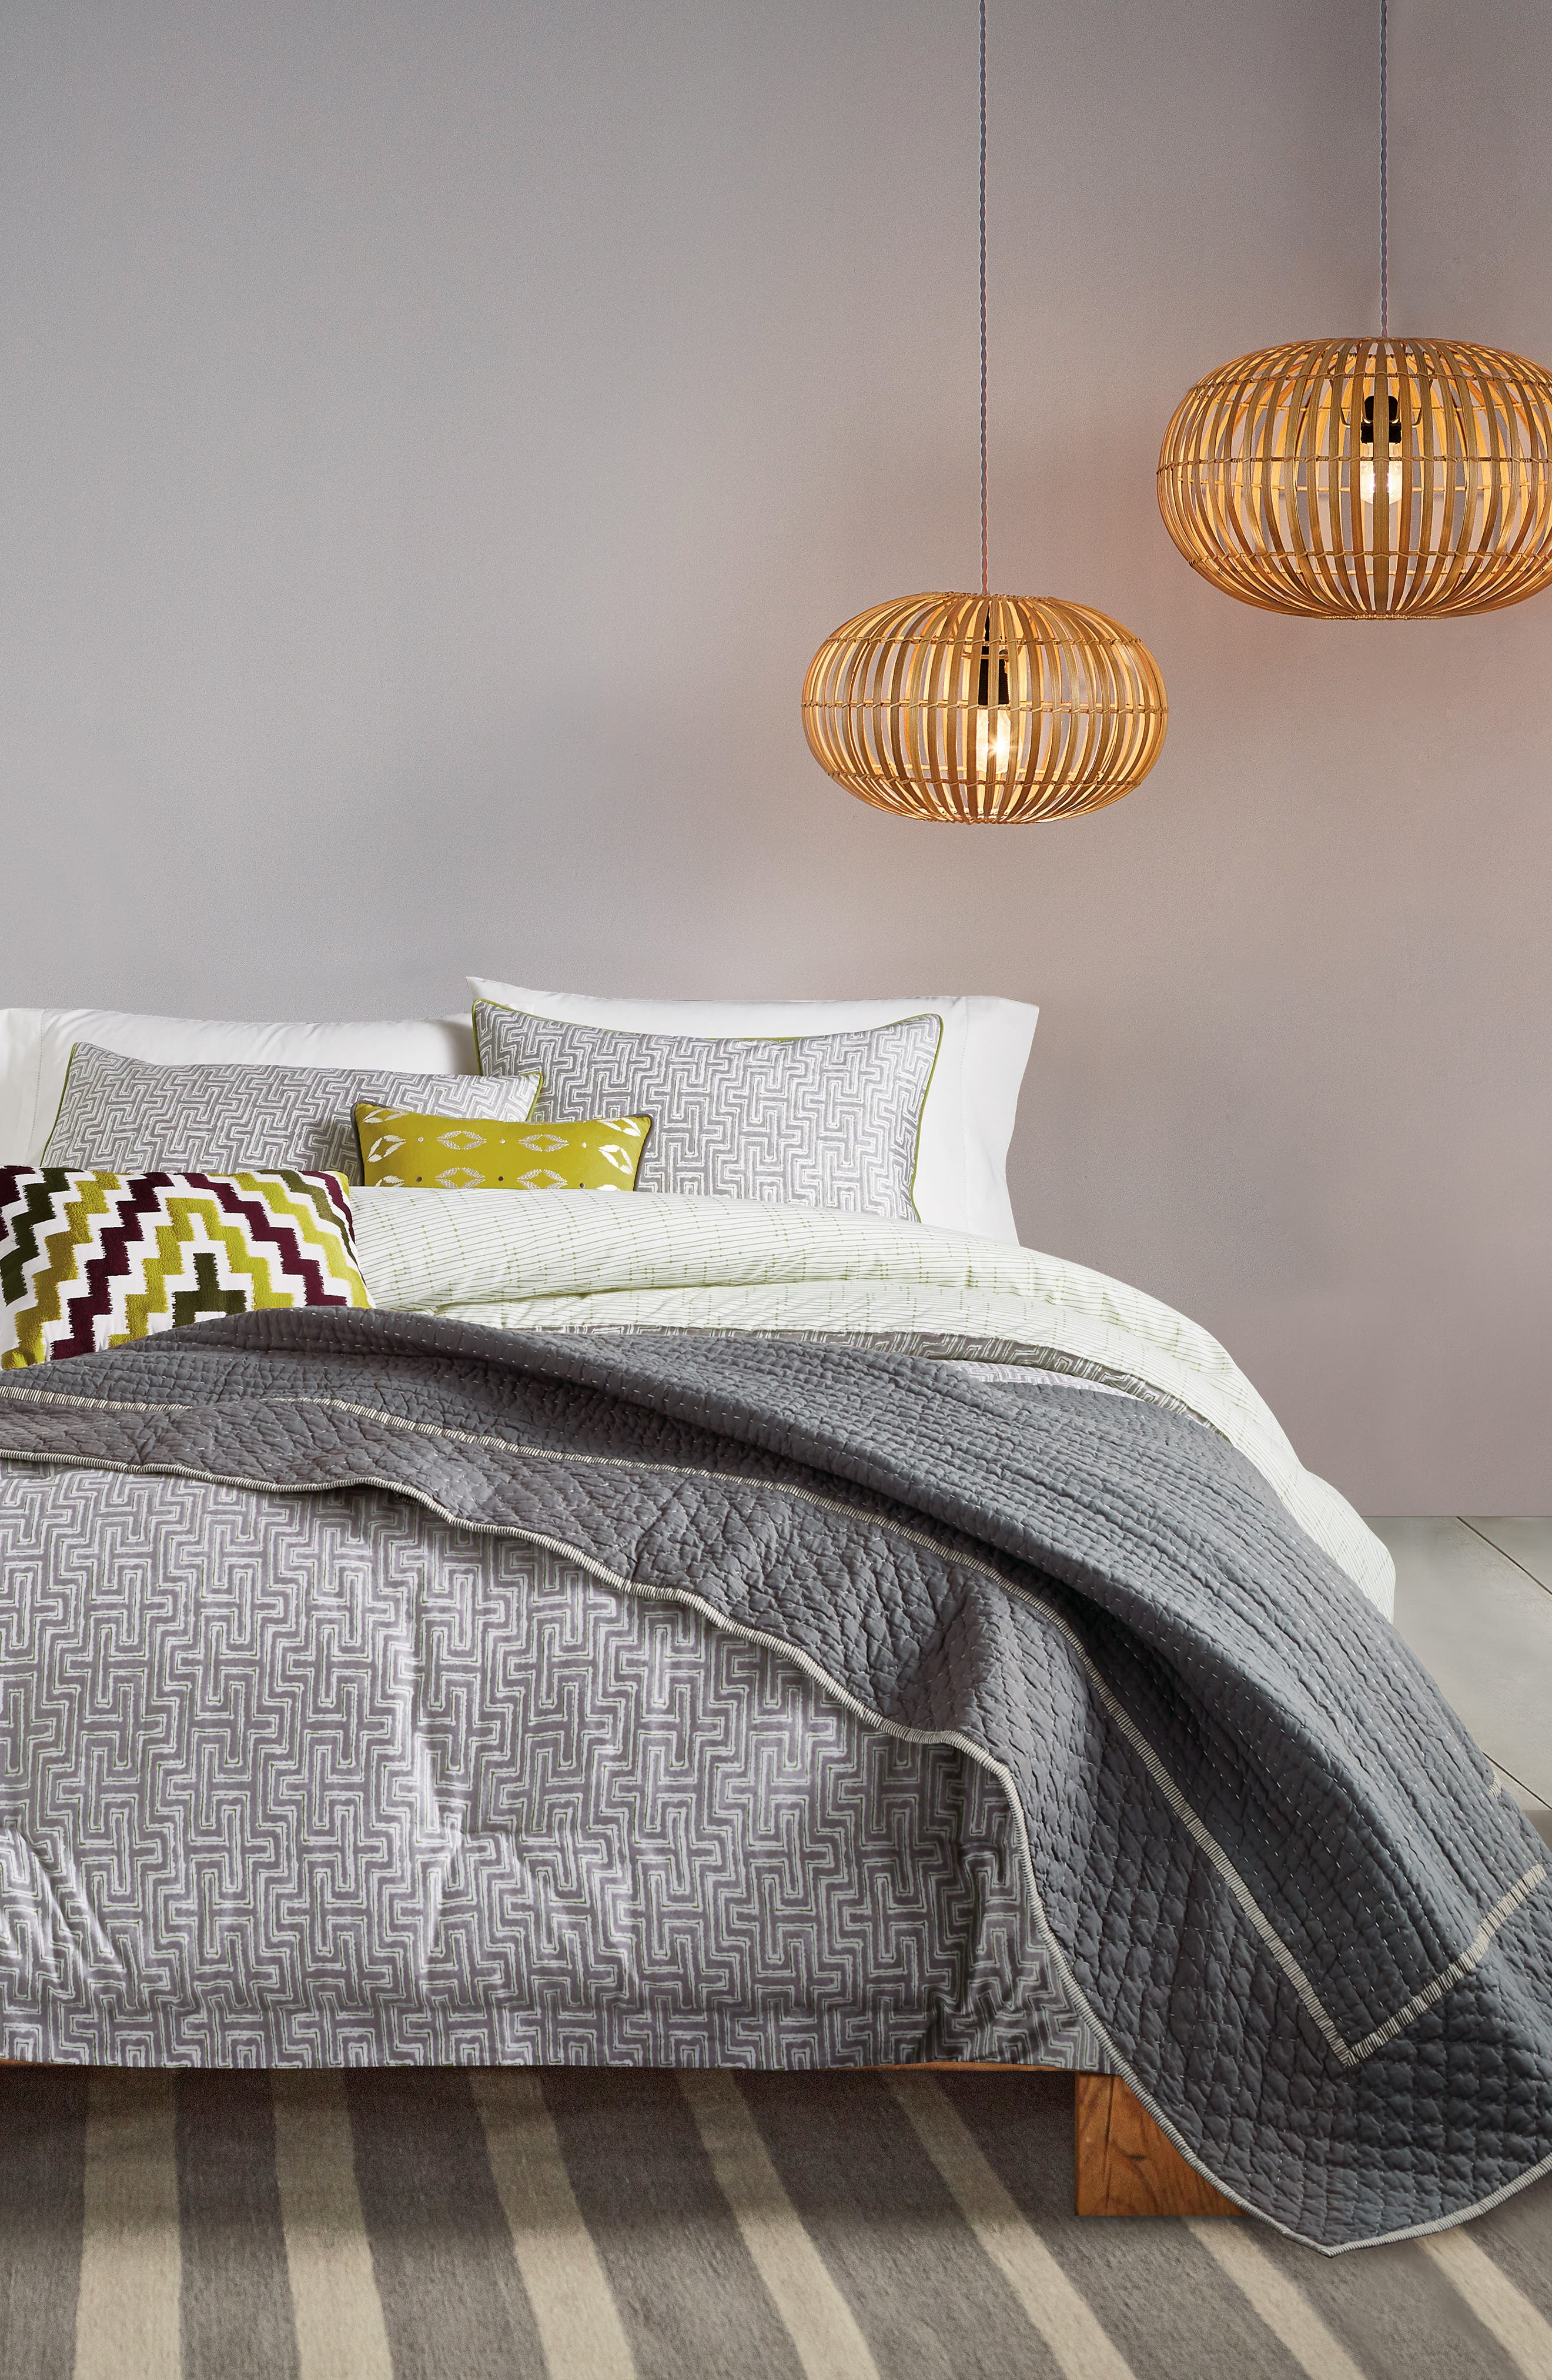 BEDECK,                             Koba Comforter, Sham & Accent Pillow Set,                             Alternate thumbnail 9, color,                             LIGHT GREY